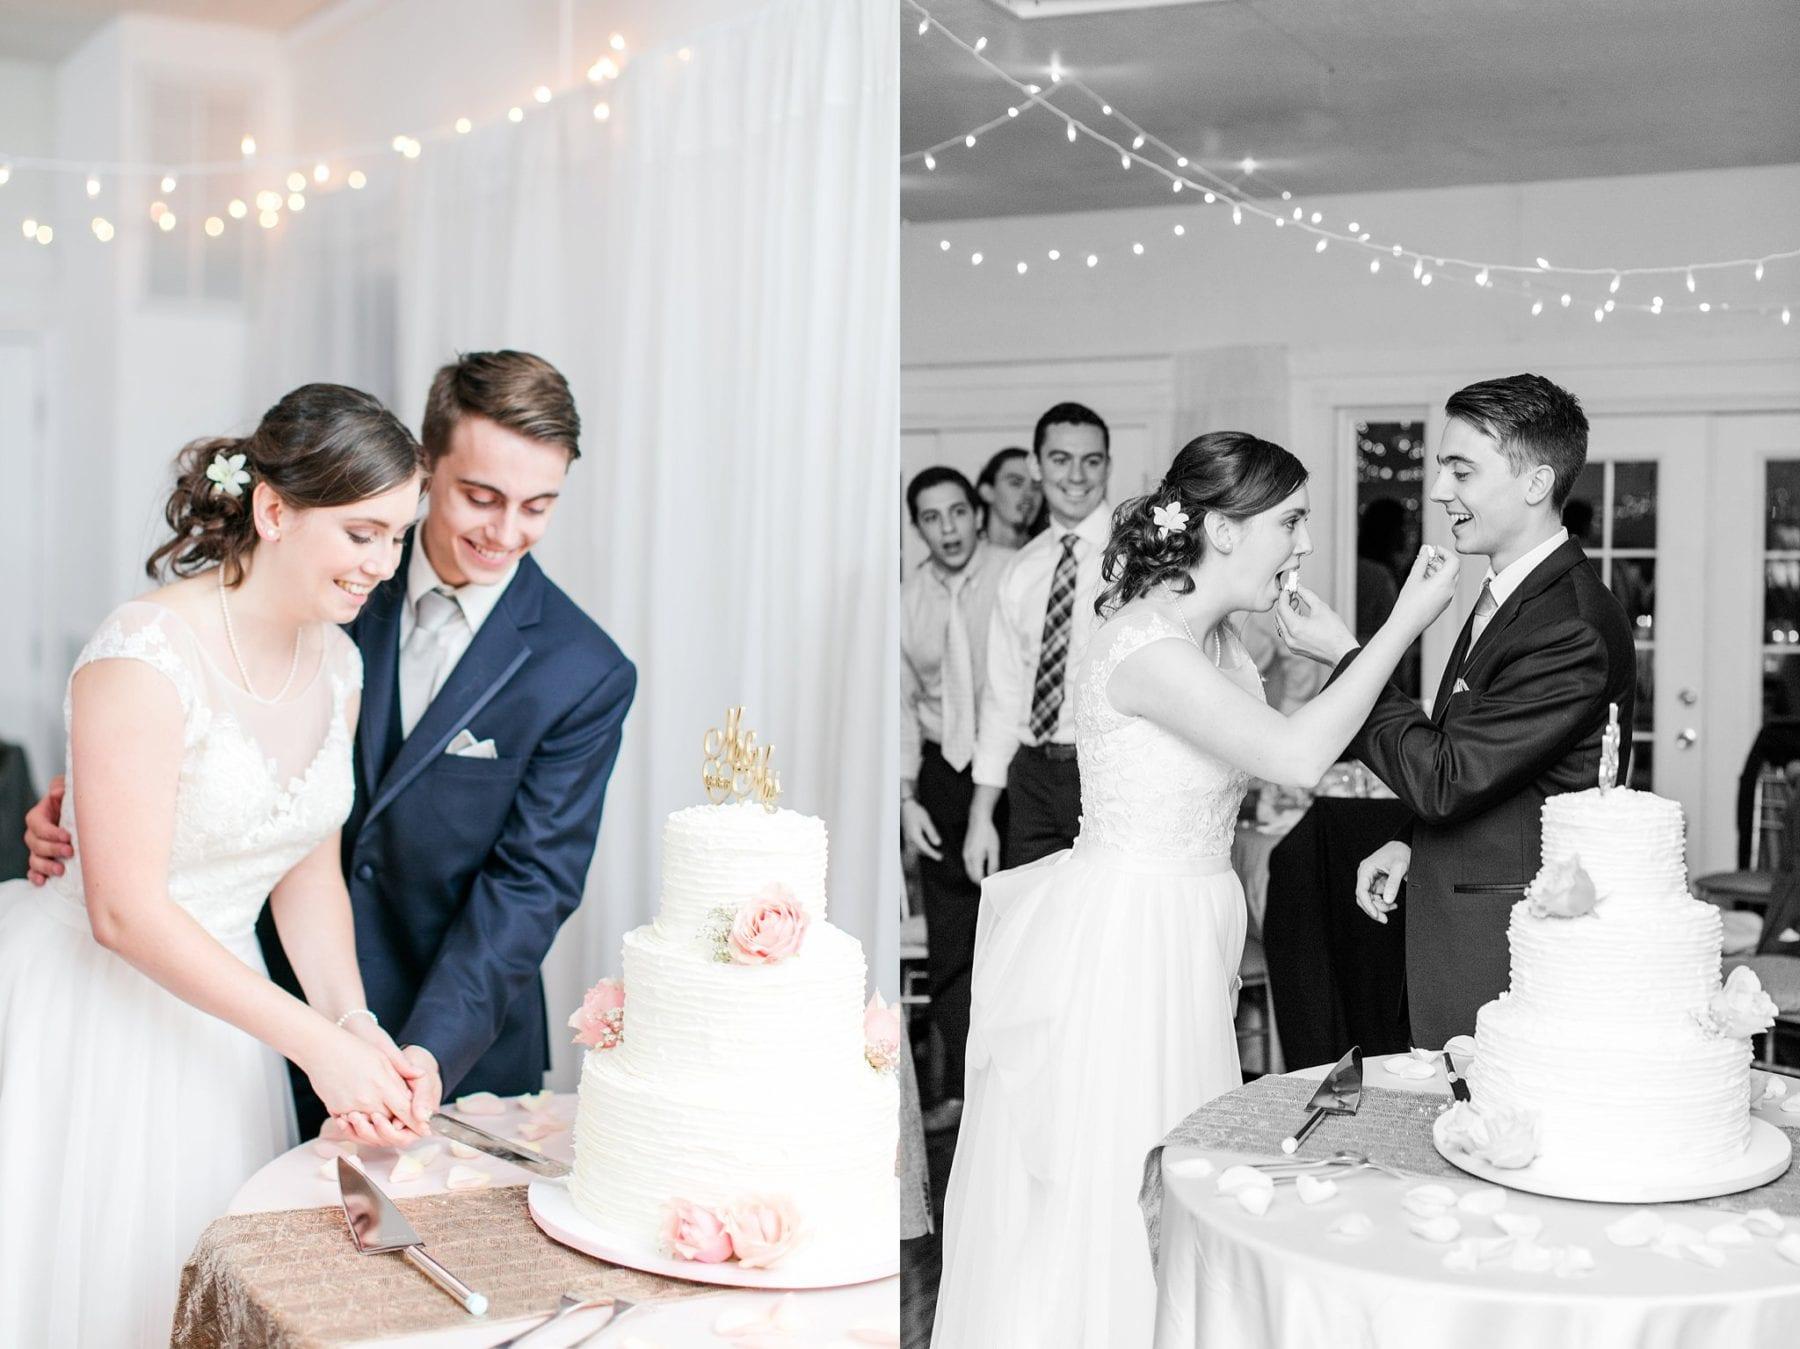 Bristow Manor Wedding Photos Virginia Wedding Photographer Lauren & Andrew Megan Kelsey Photography-863.jpg